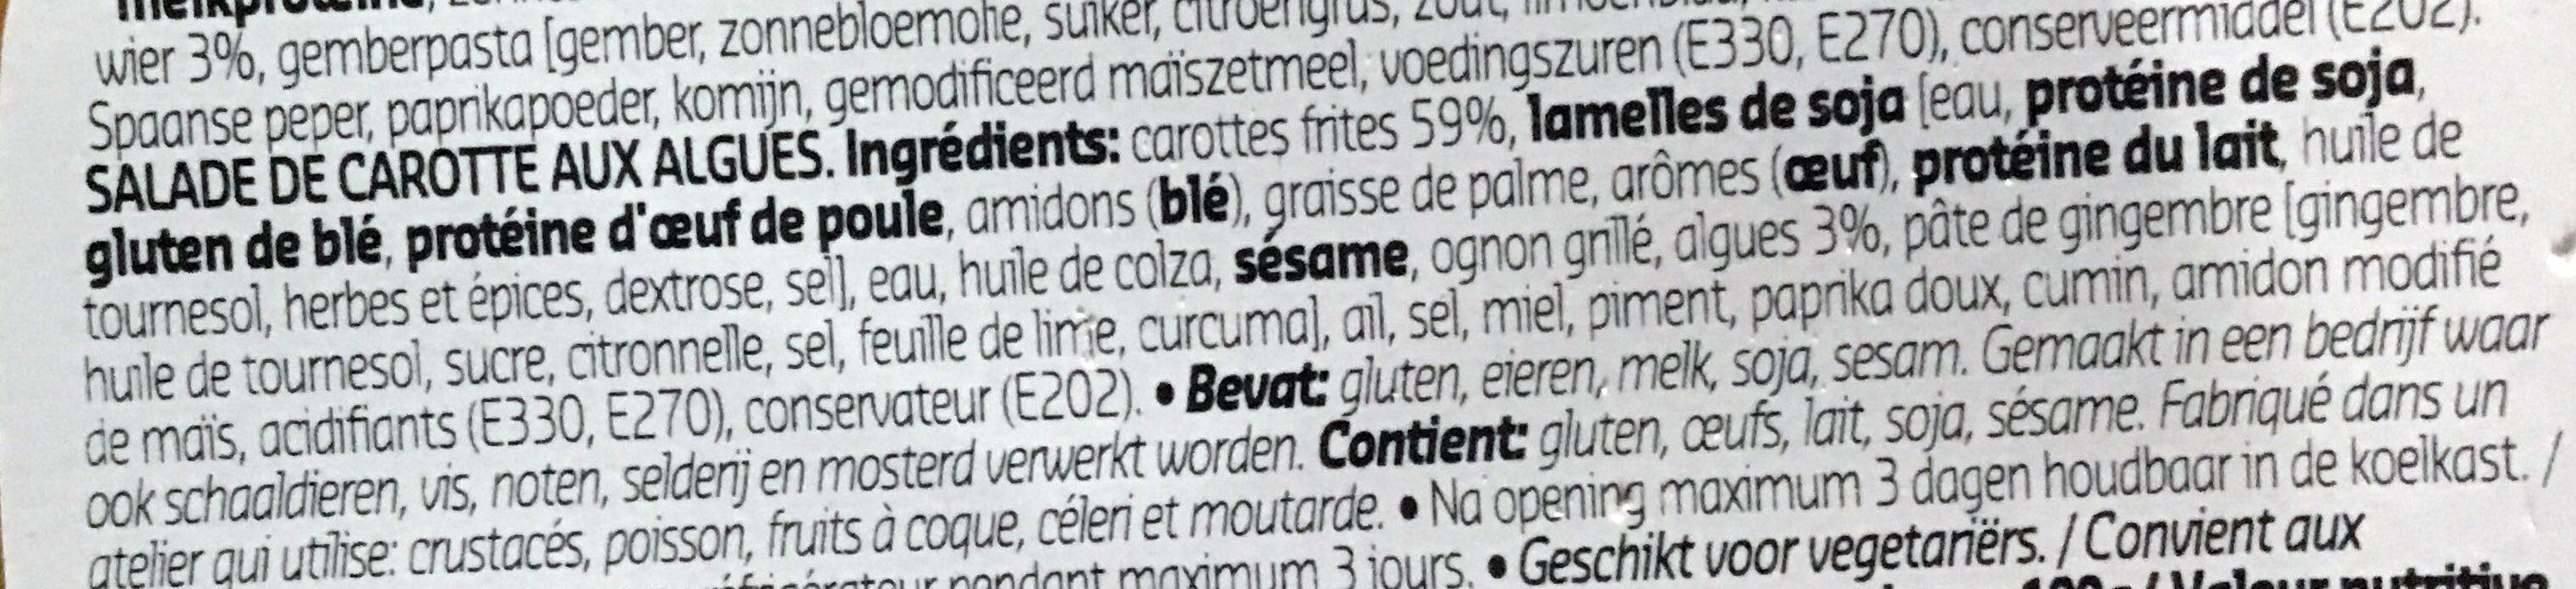 Salade de carottes aux algues - Ingrediënten - fr